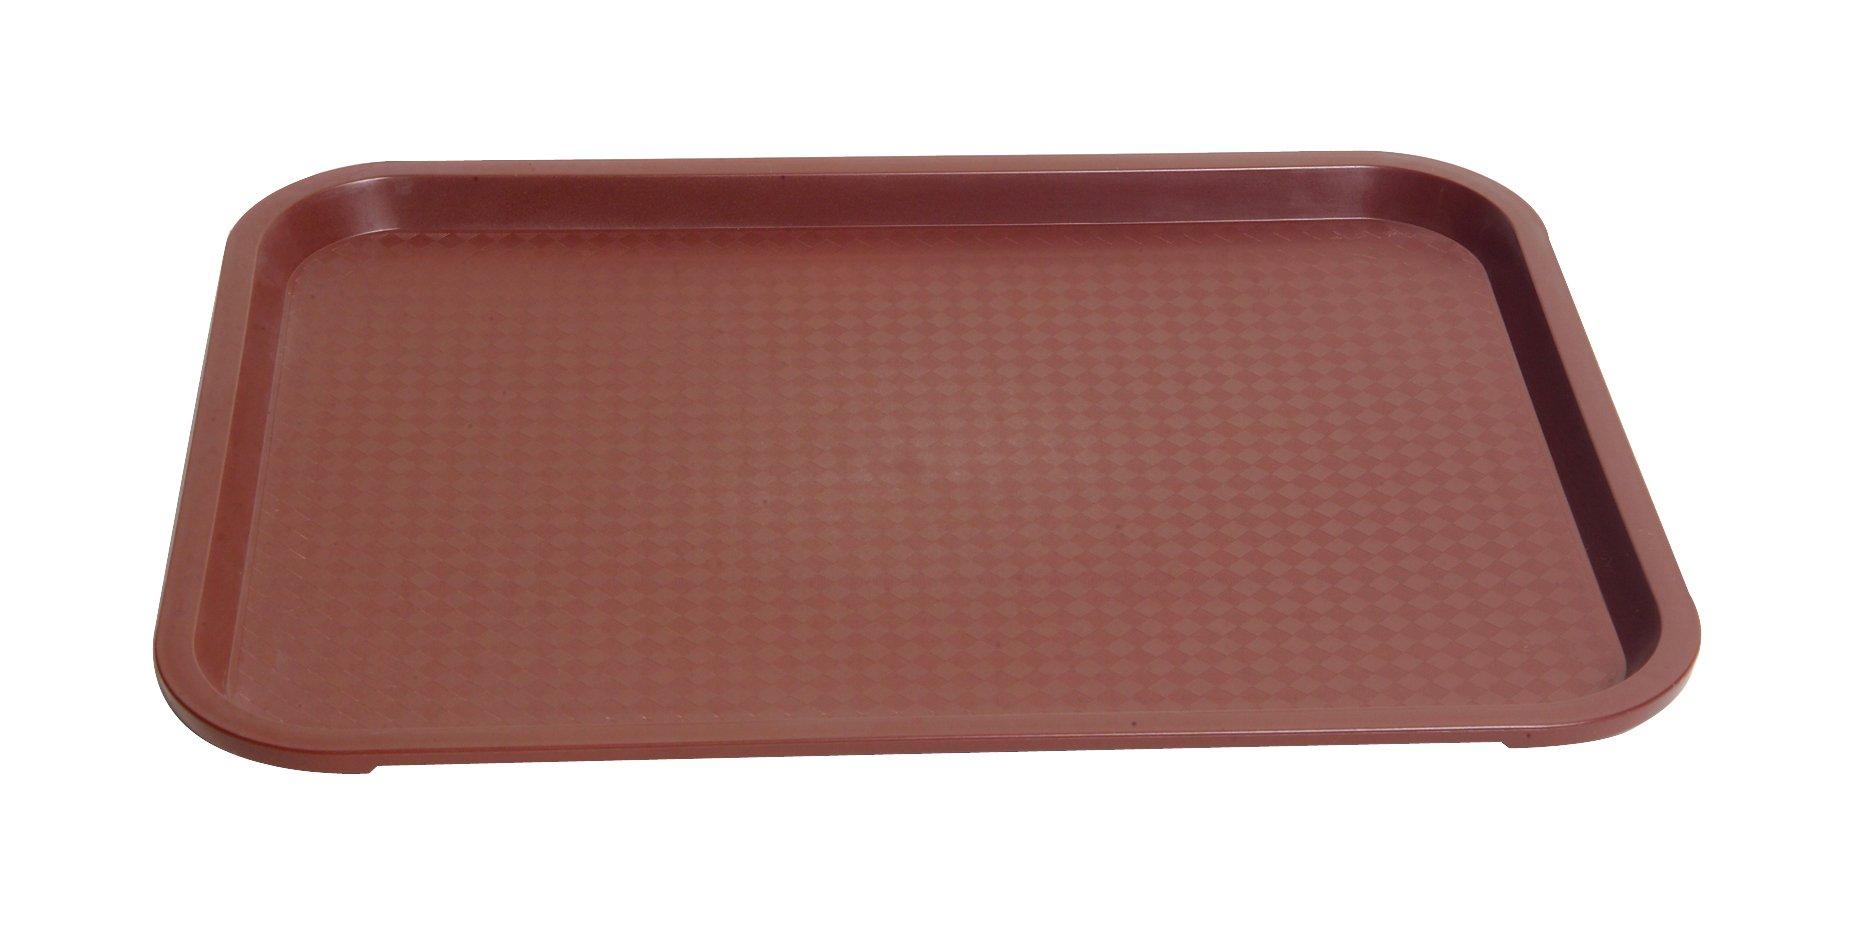 United Scientific LTRAY1 Polypropylene Flat Laboratory Tray, 15'' L x 0.8'' W x 5'' H (Pack of 10)